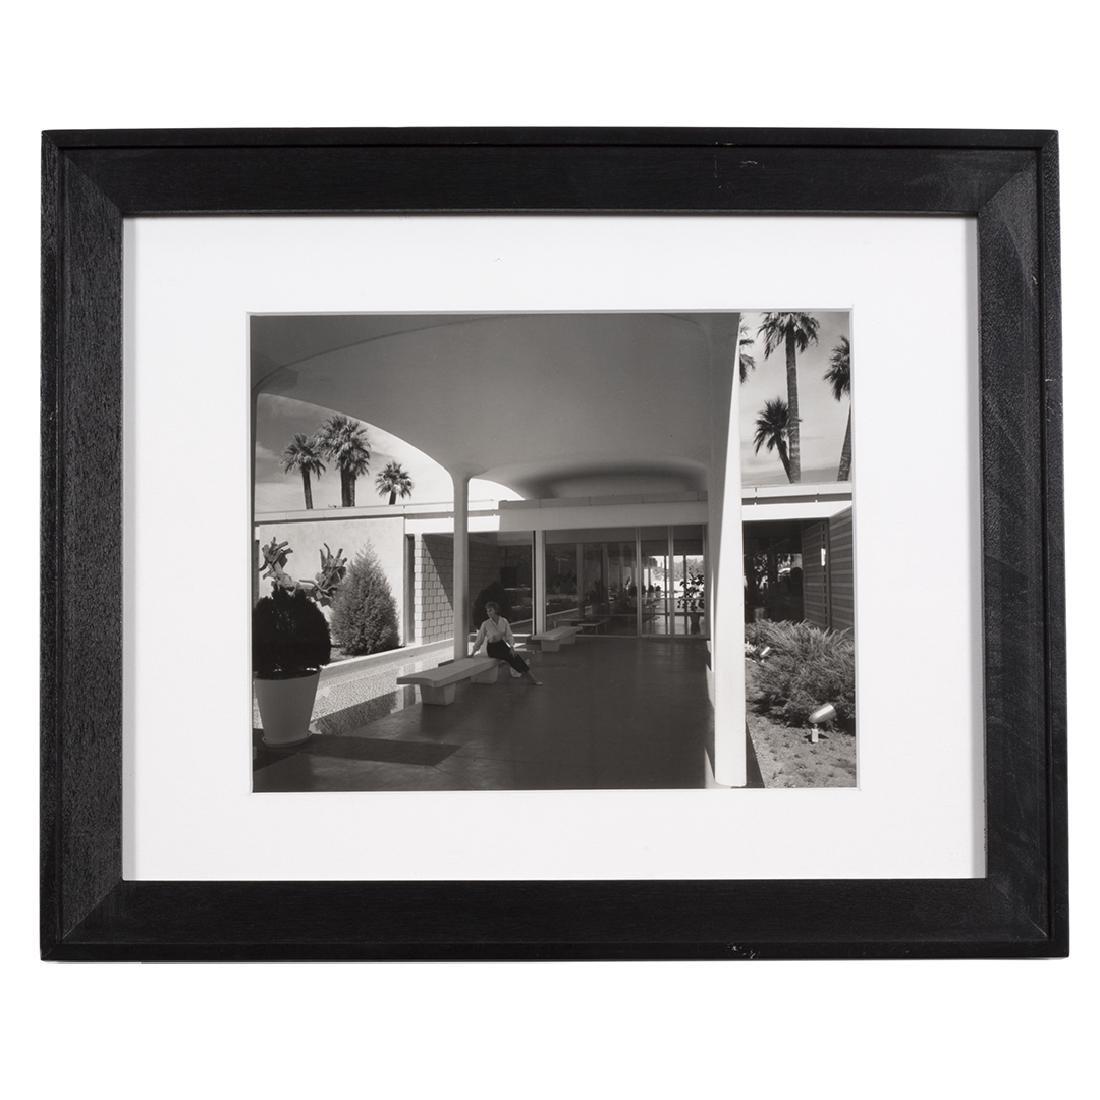 Julius Shulman William F. Cody Photographs (2)